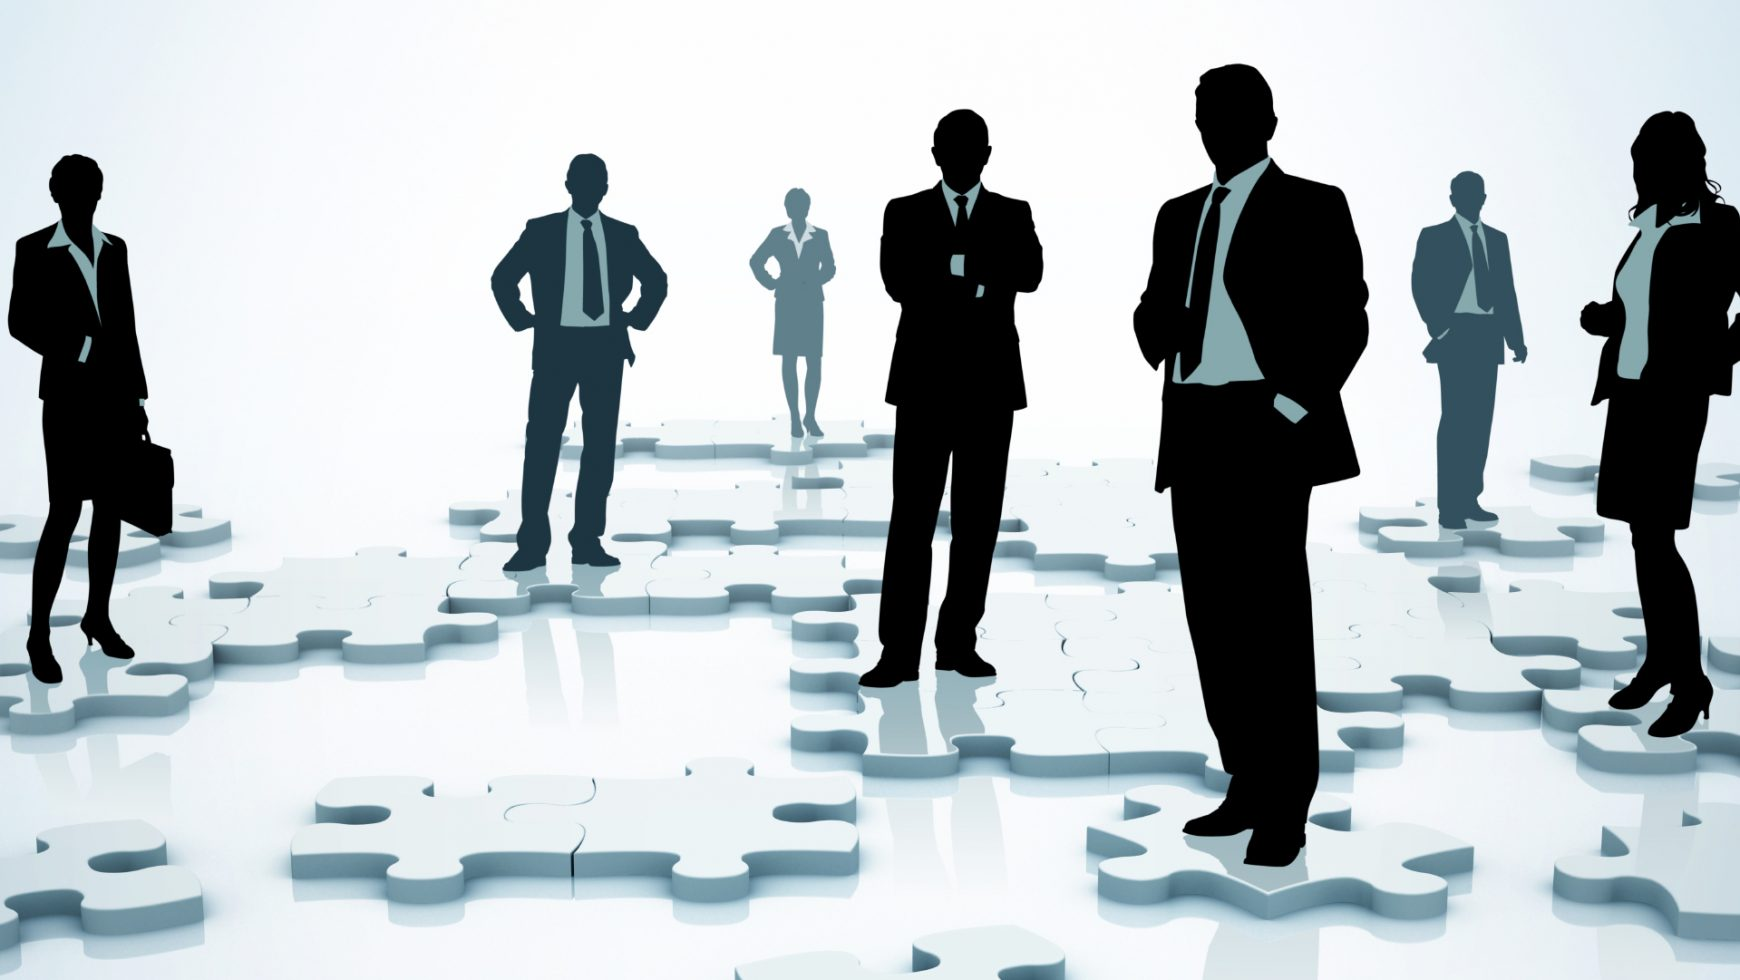 Choisir sa formation : les principales sources d'information